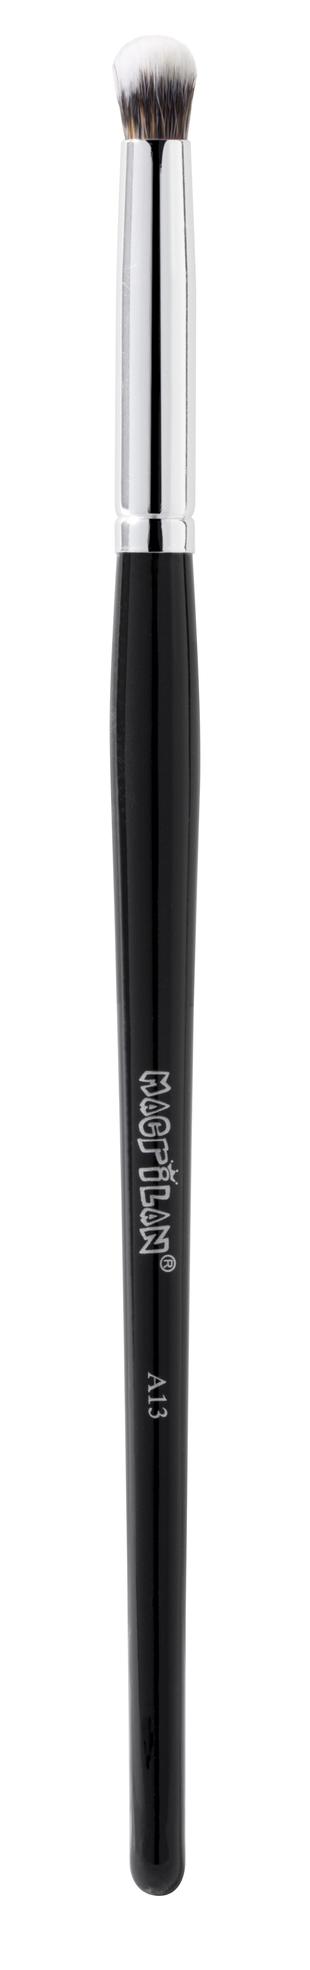 Pincel de Esfumar Detalhes para Olhos A13 Macrilan